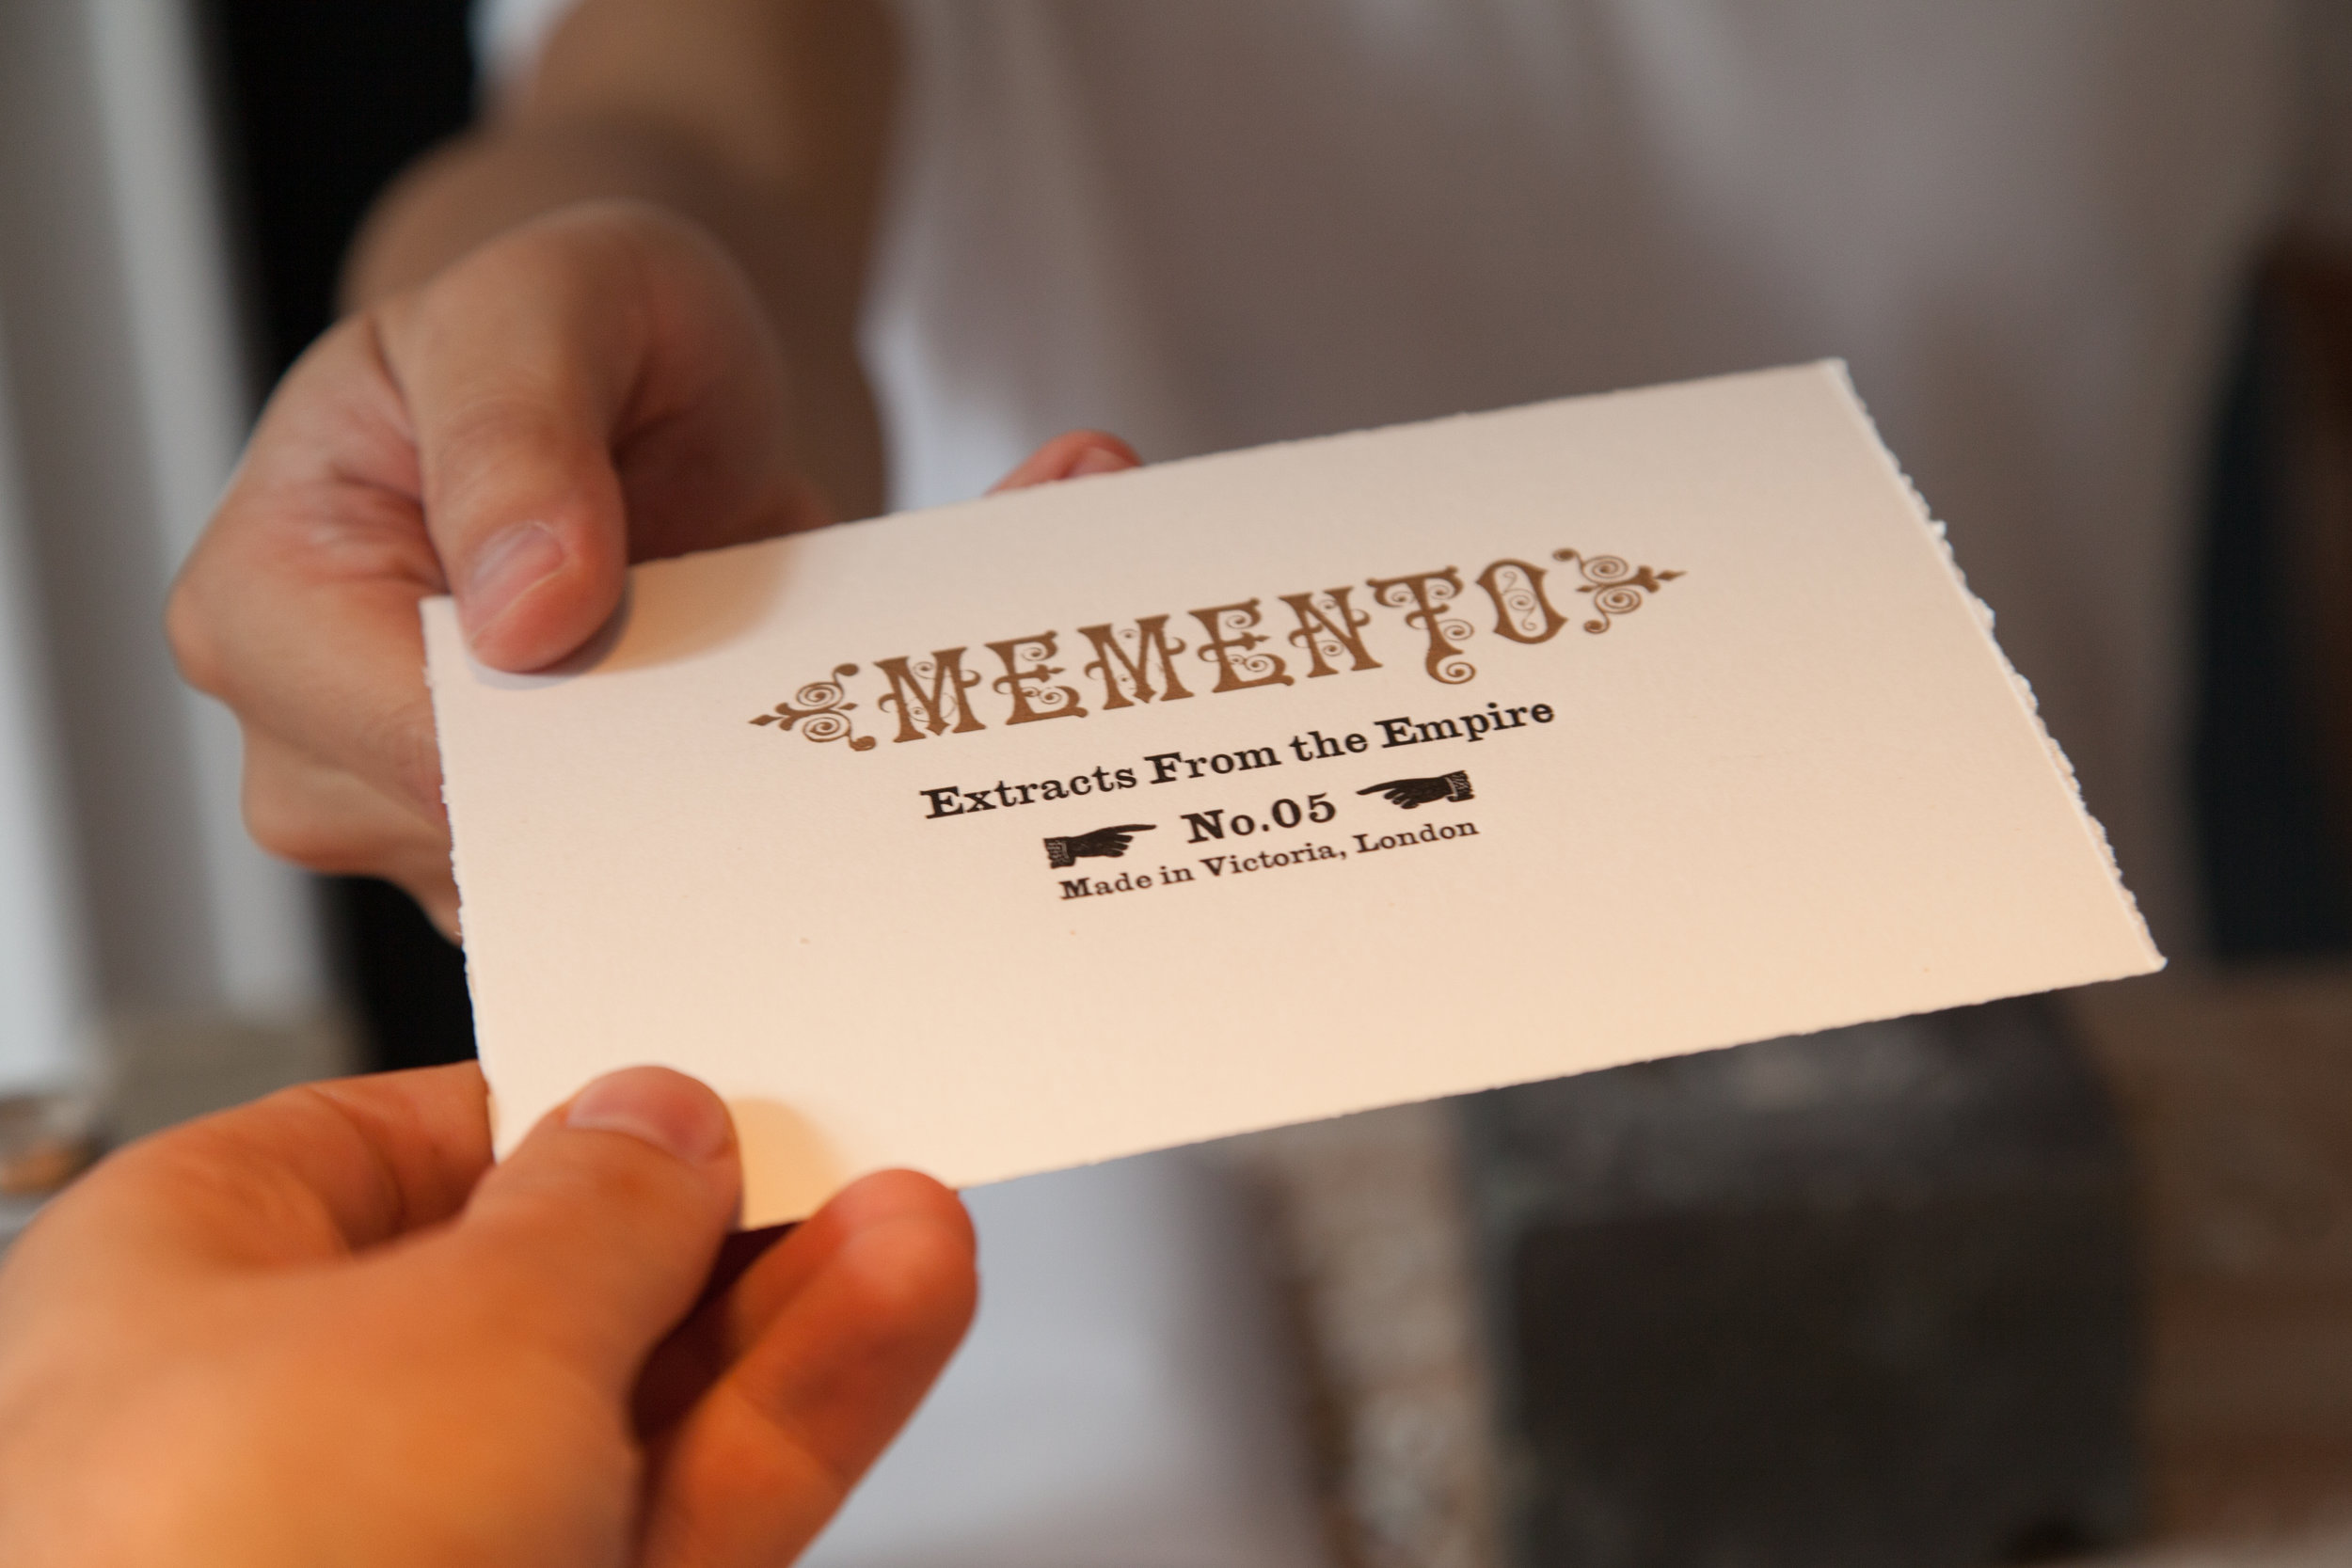 Memento letterpressed proof of authenticity, Delfina Foundation, Victoria, London, 2017. Photo: Christian Lübbert